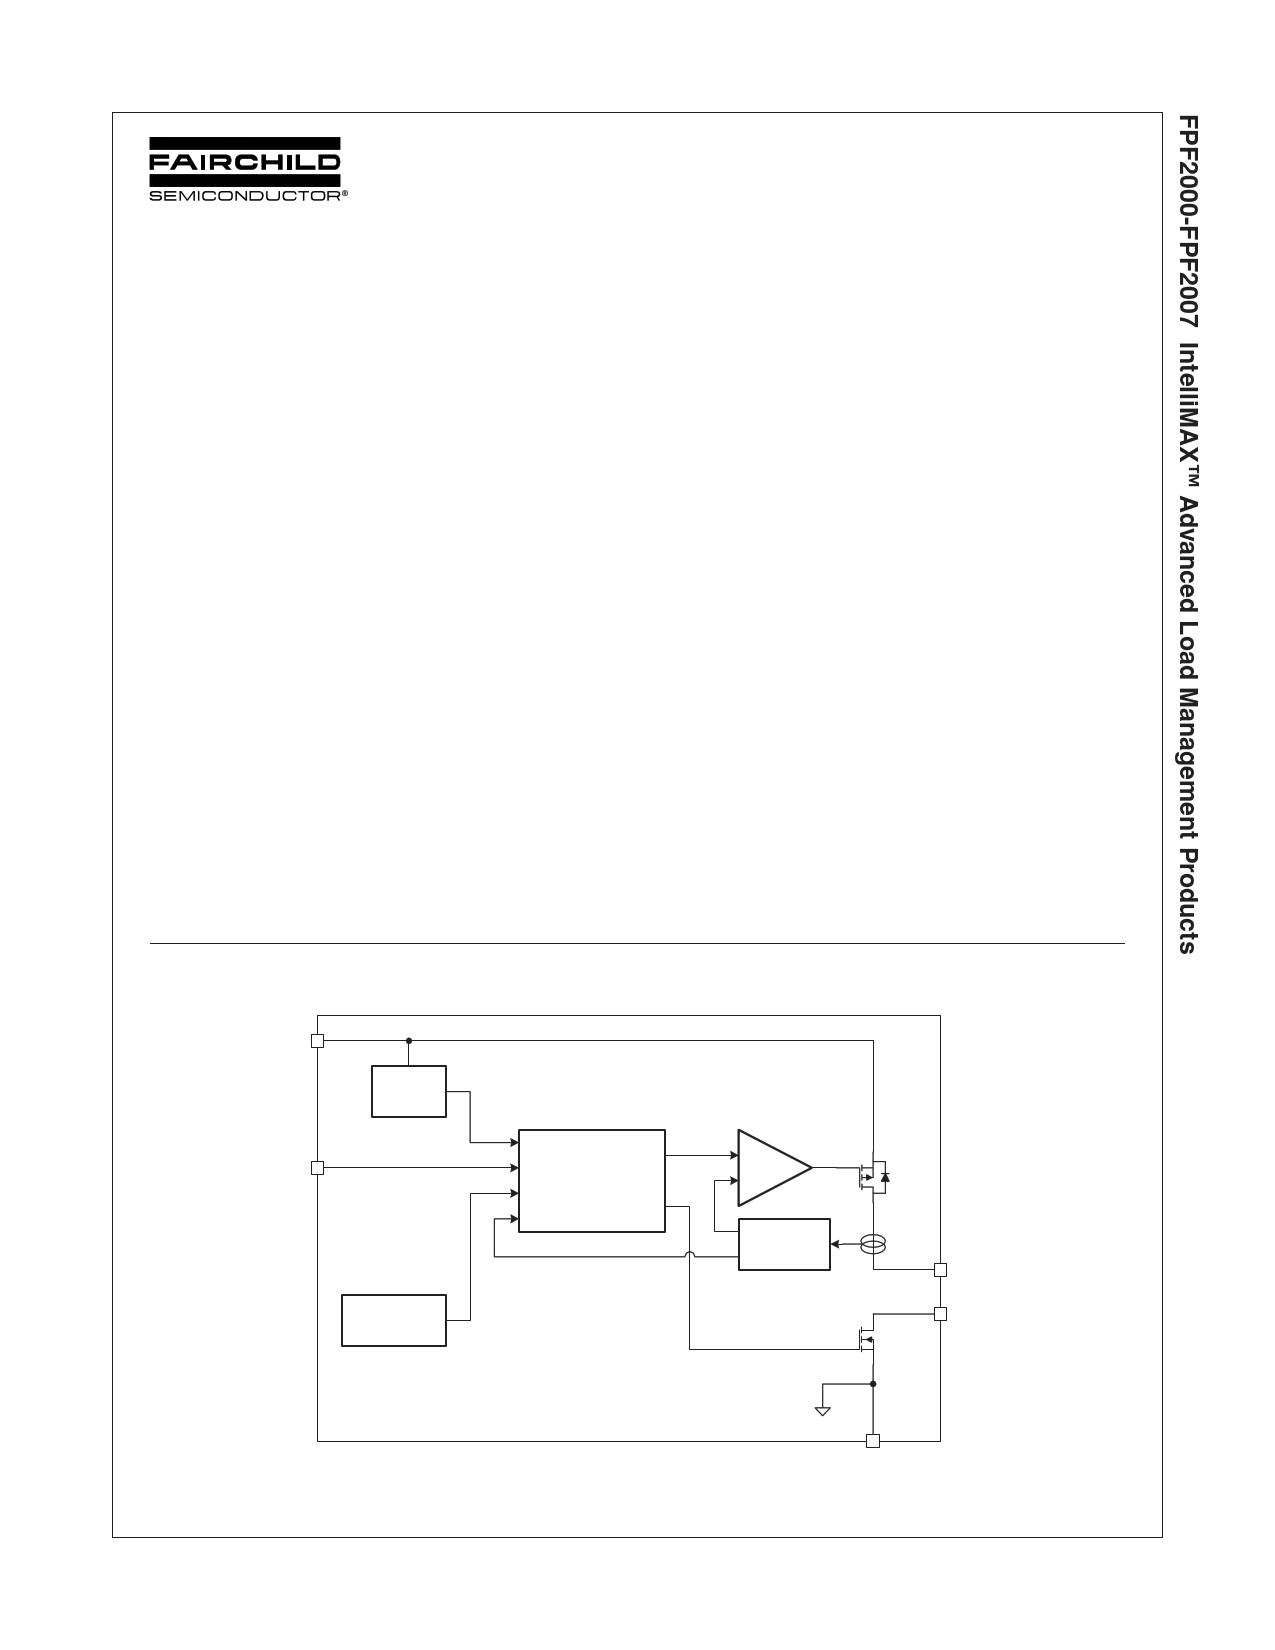 FPF2004 datasheet